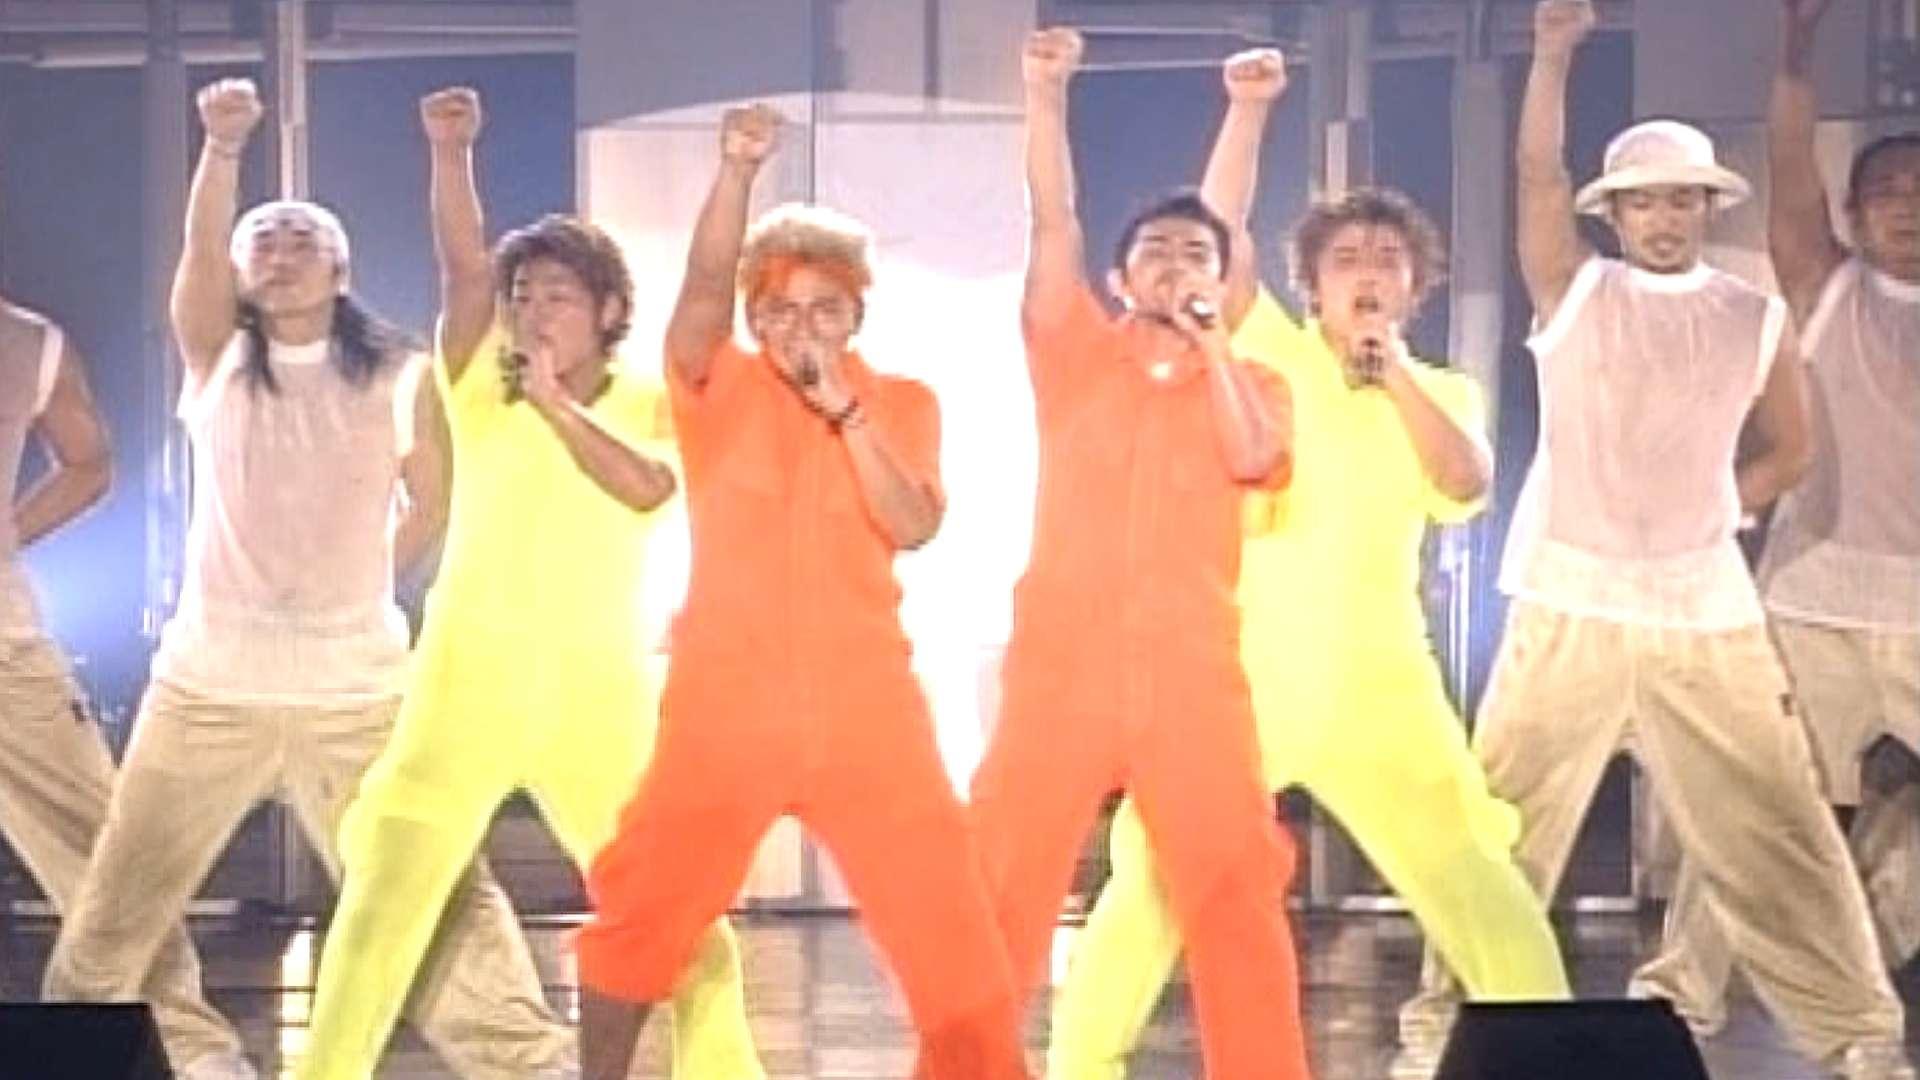 DA PUMP TOUR 2000 BEAT BALL/DA PUMP